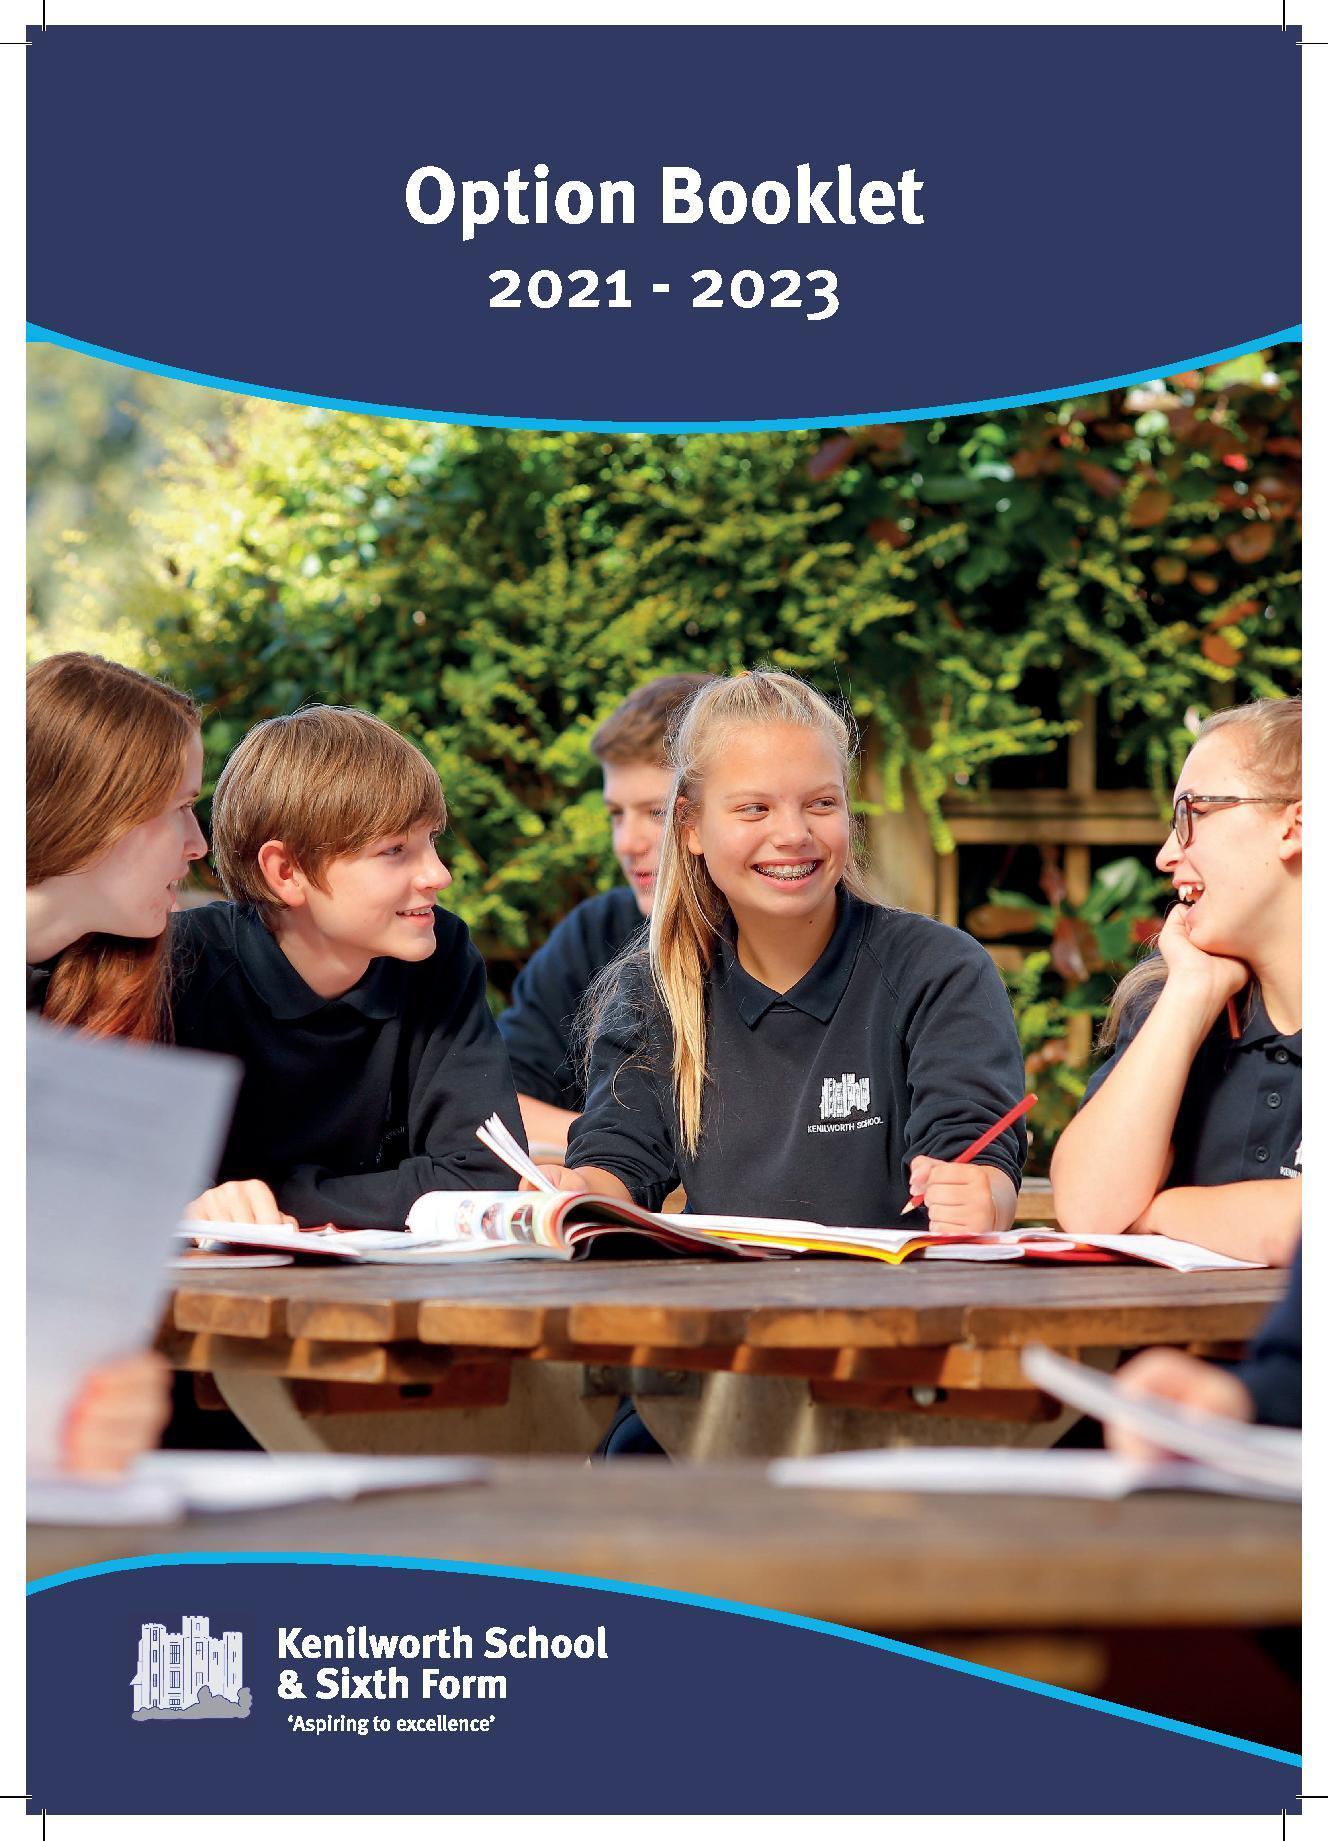 Kenilworth option booklet 2020 2022